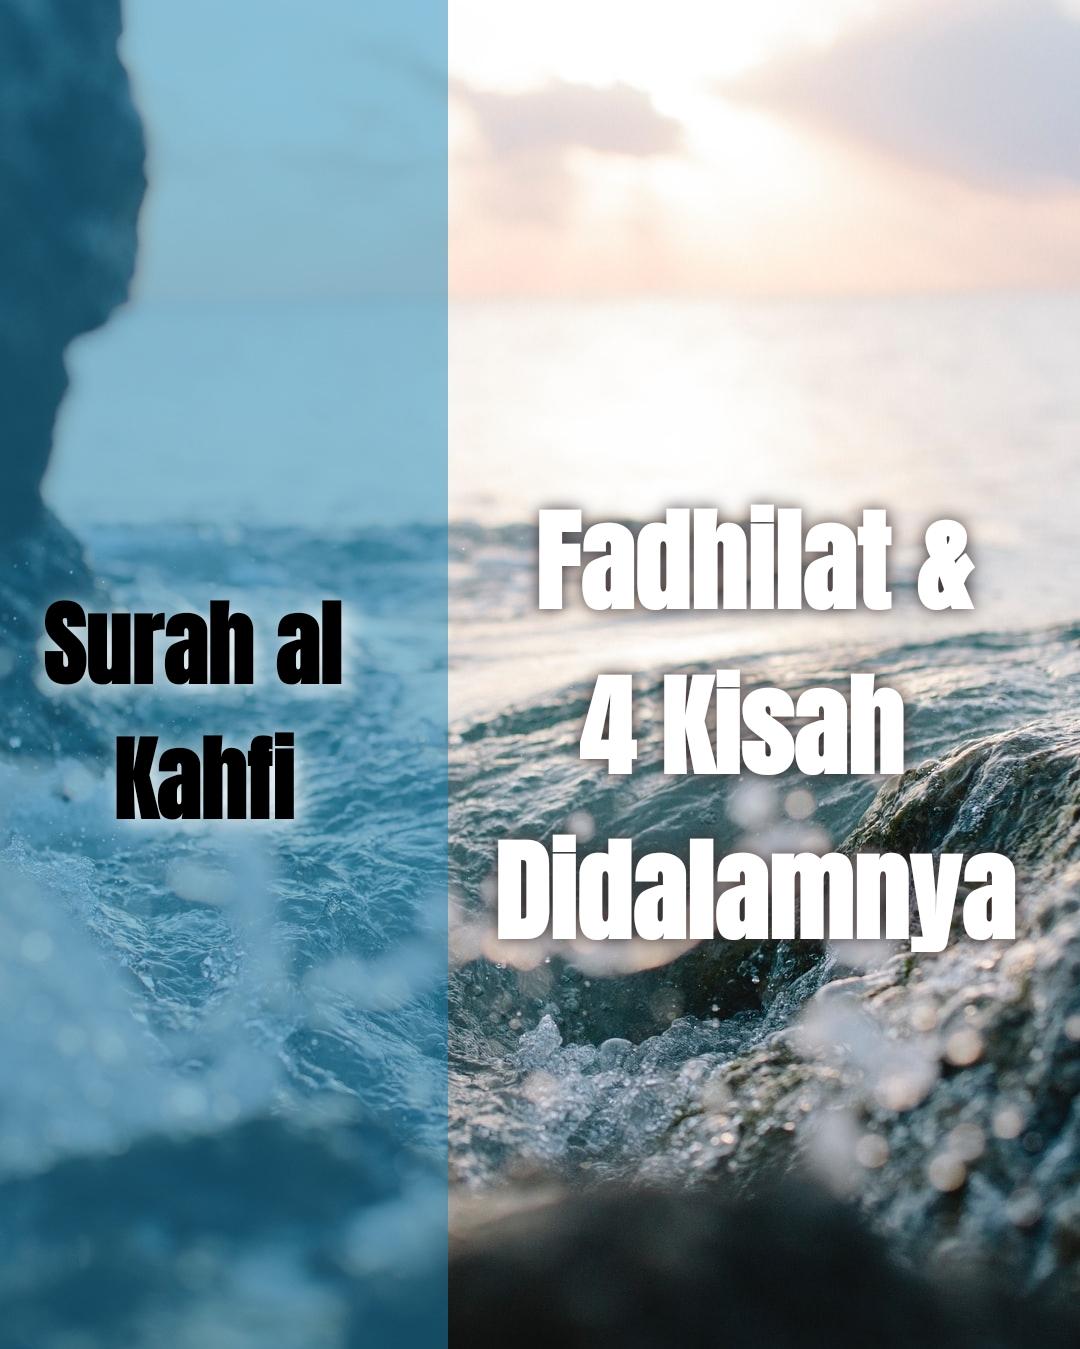 Surah al Kahfi, 4 Kisah Di Dalamnya Dan Fadhilatnya